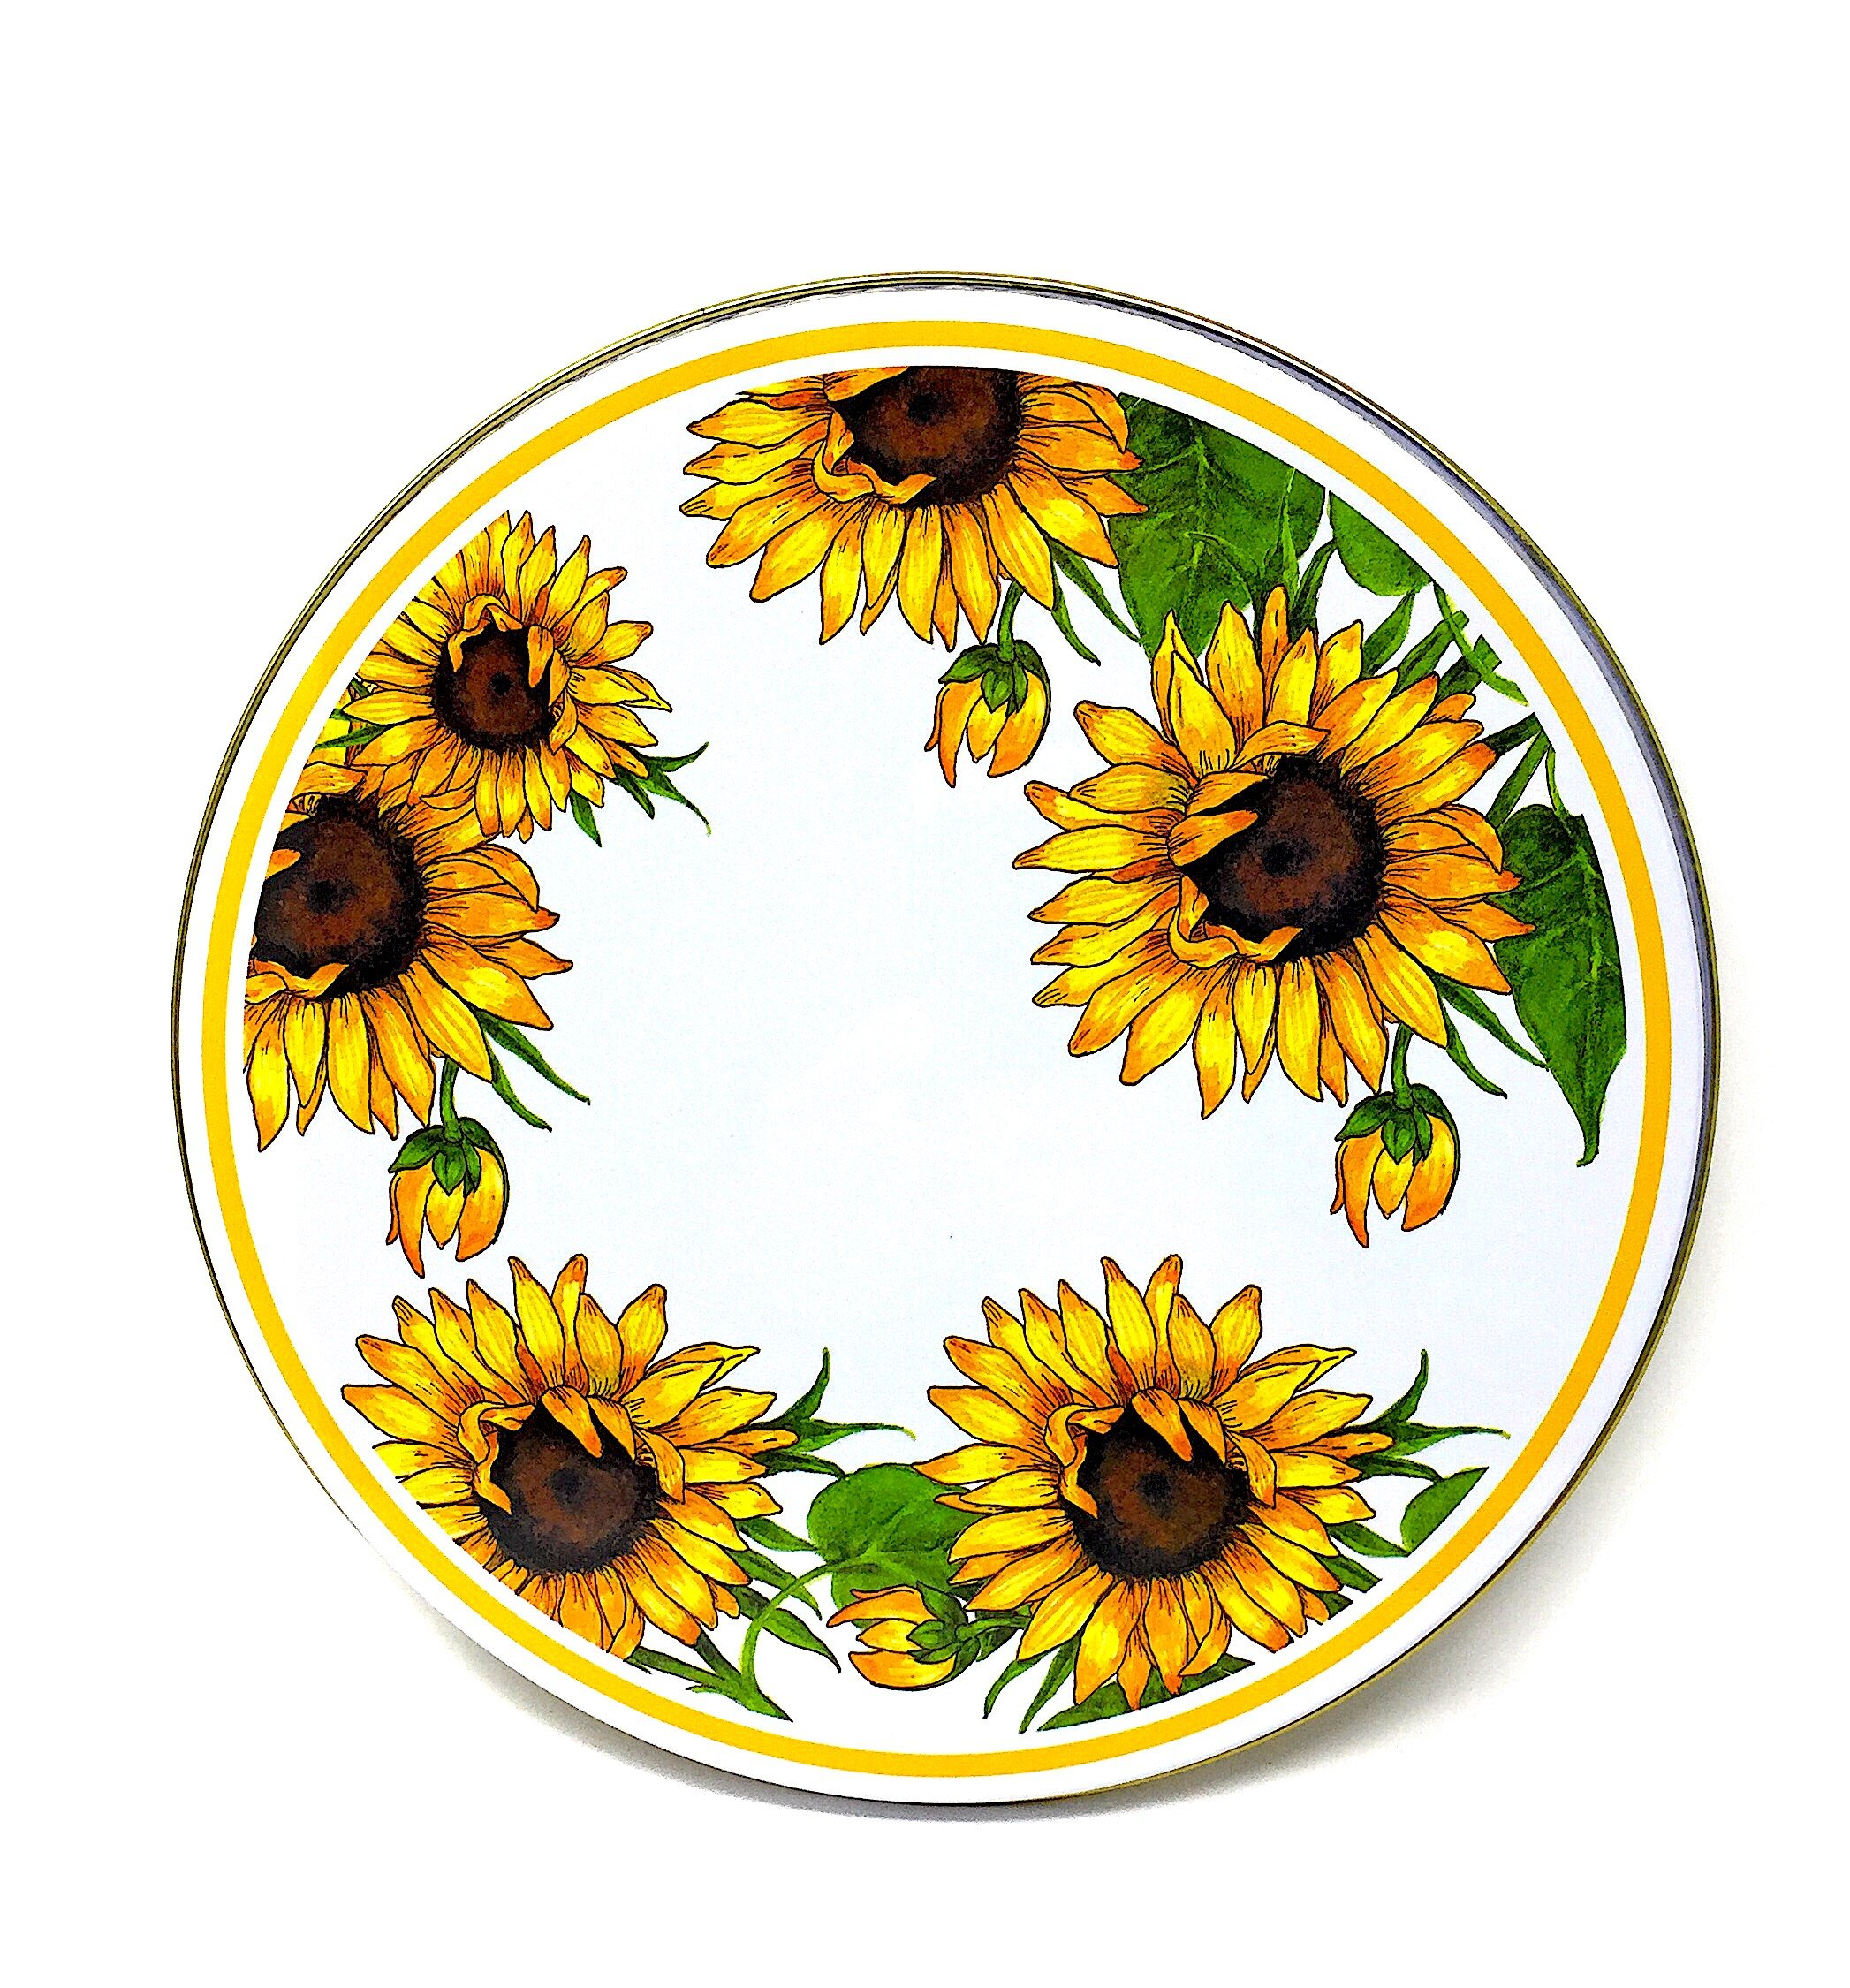 Electric Stove Burner Range Covers Decorative Set of 4 (Sunflowers)